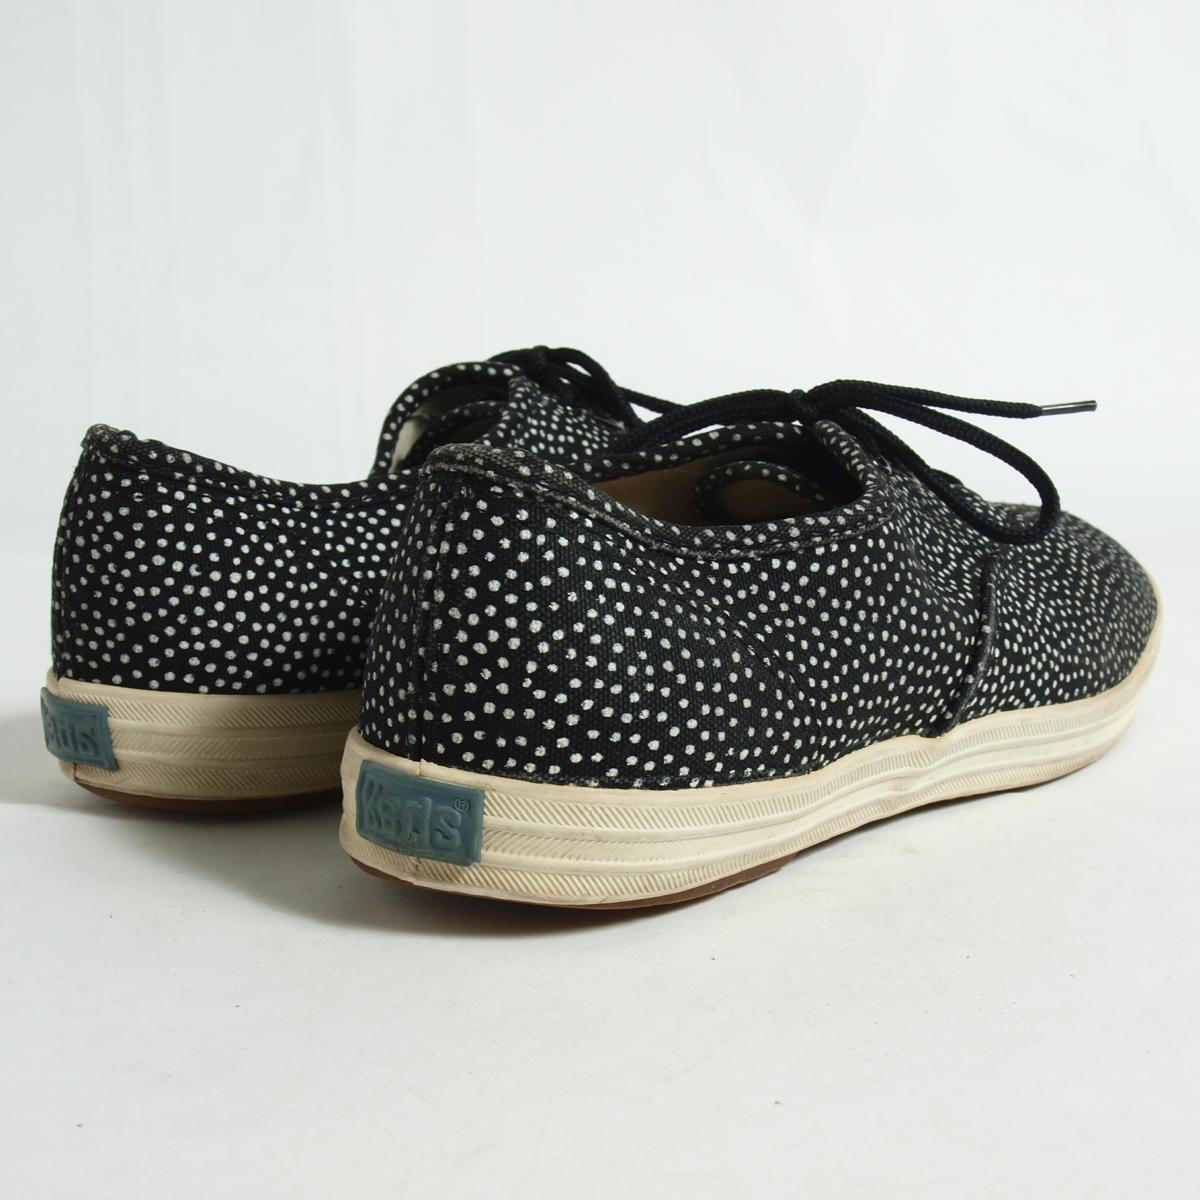 Keds韩国制造帆布运动鞋8.5M 25.0cm复古KEDS/bok6906